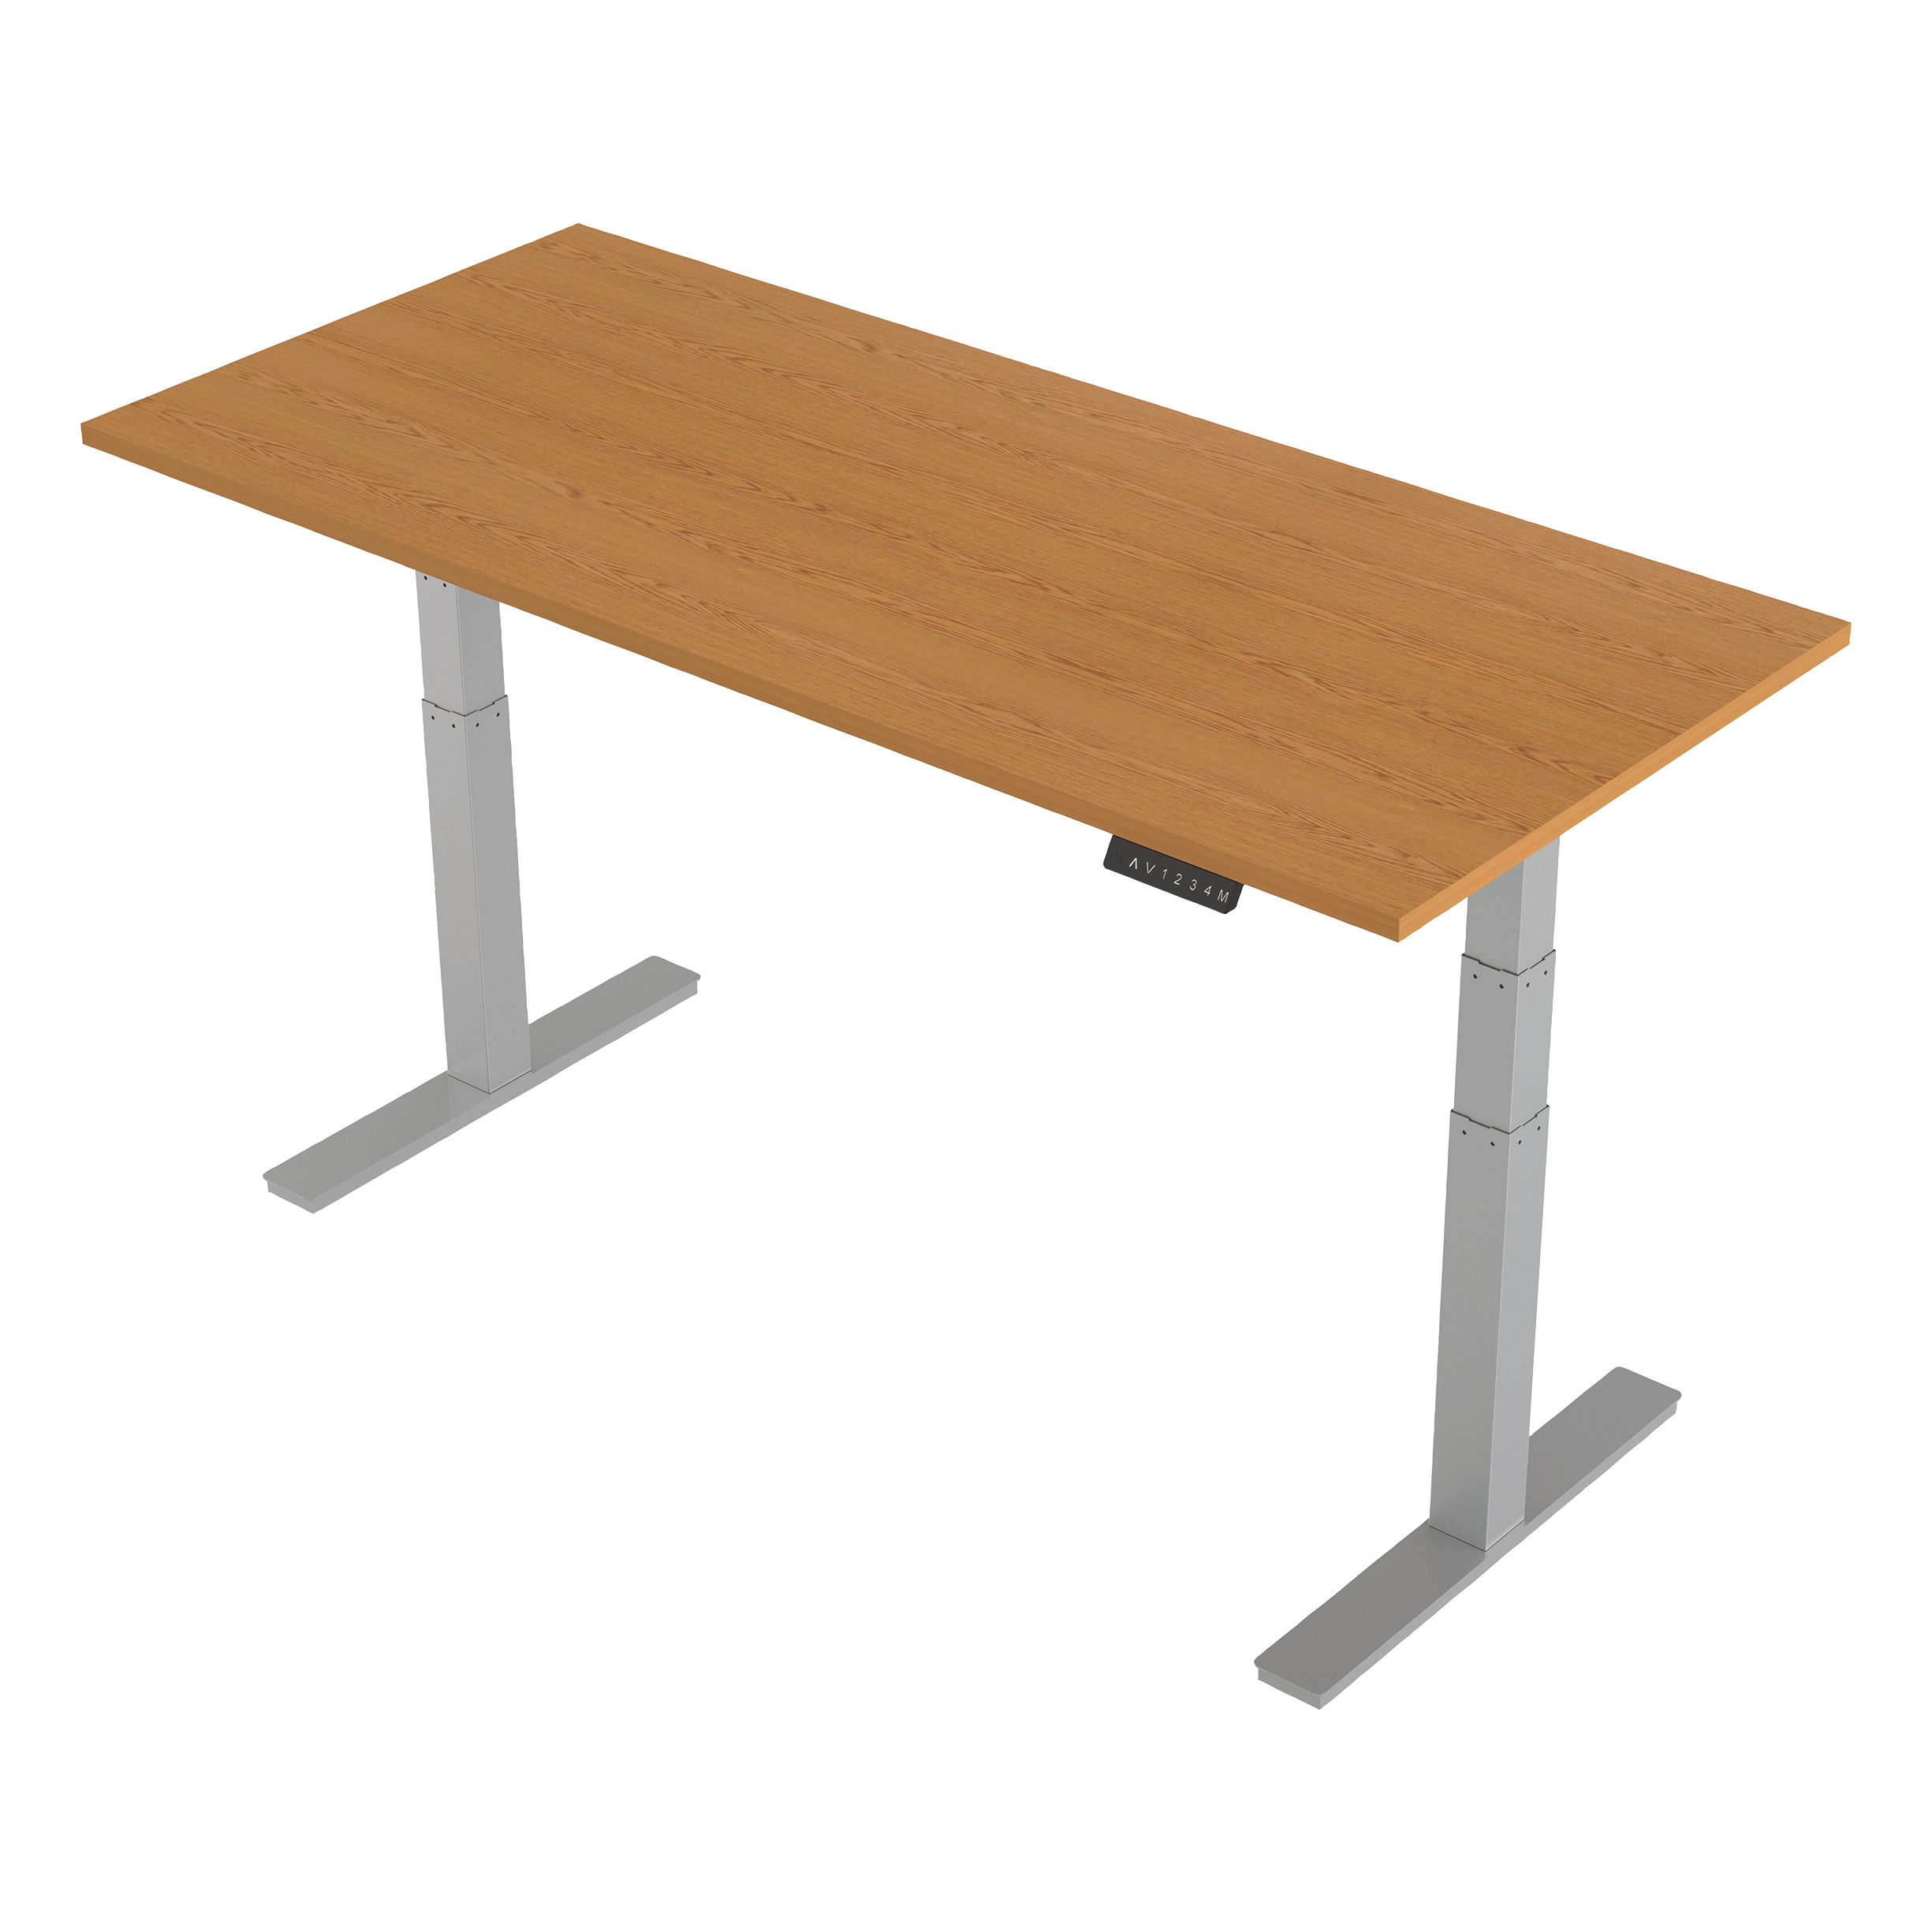 Trexus Sit-Stand Desk Height-adjustable Silver Leg Frame 1800/800mm Oak Ref HA01020